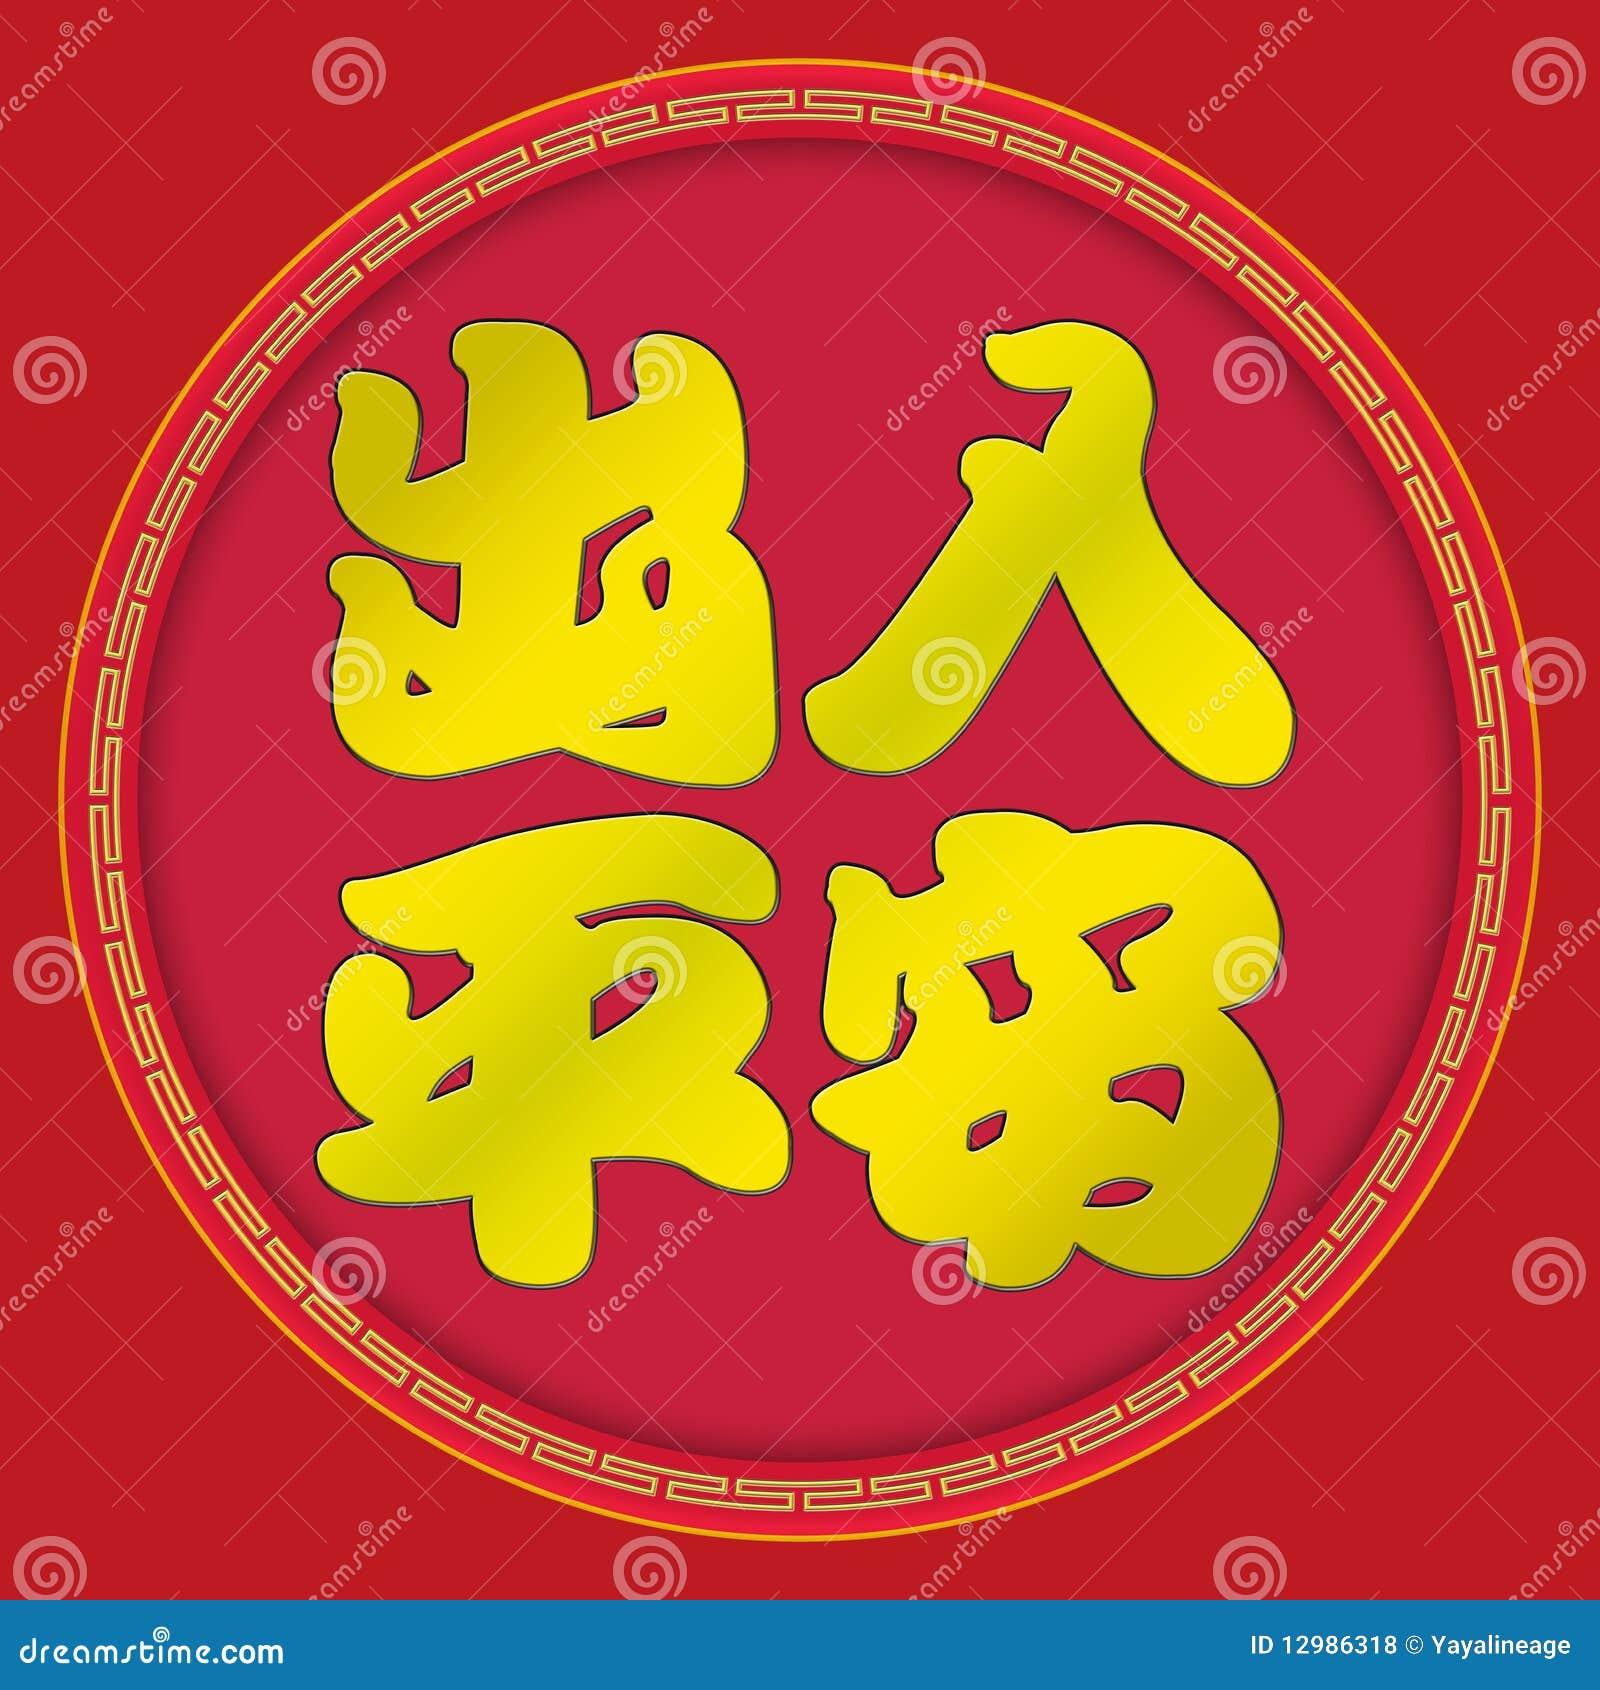 Wish you safety wherever you go chinese new year stock wish you safety wherever you go chinese new year buycottarizona Images